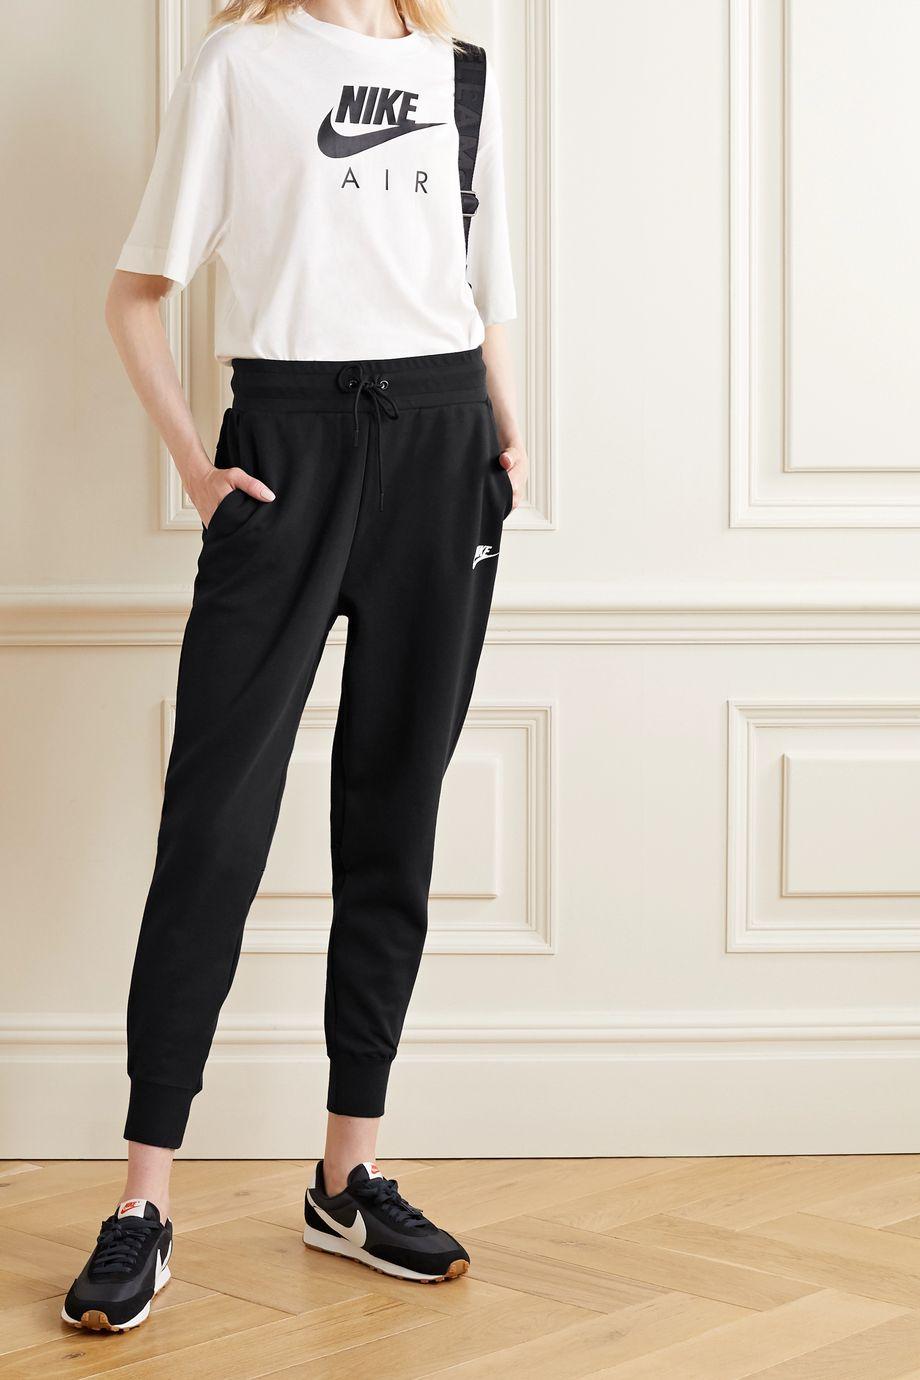 Nike Cotton-blend track pants